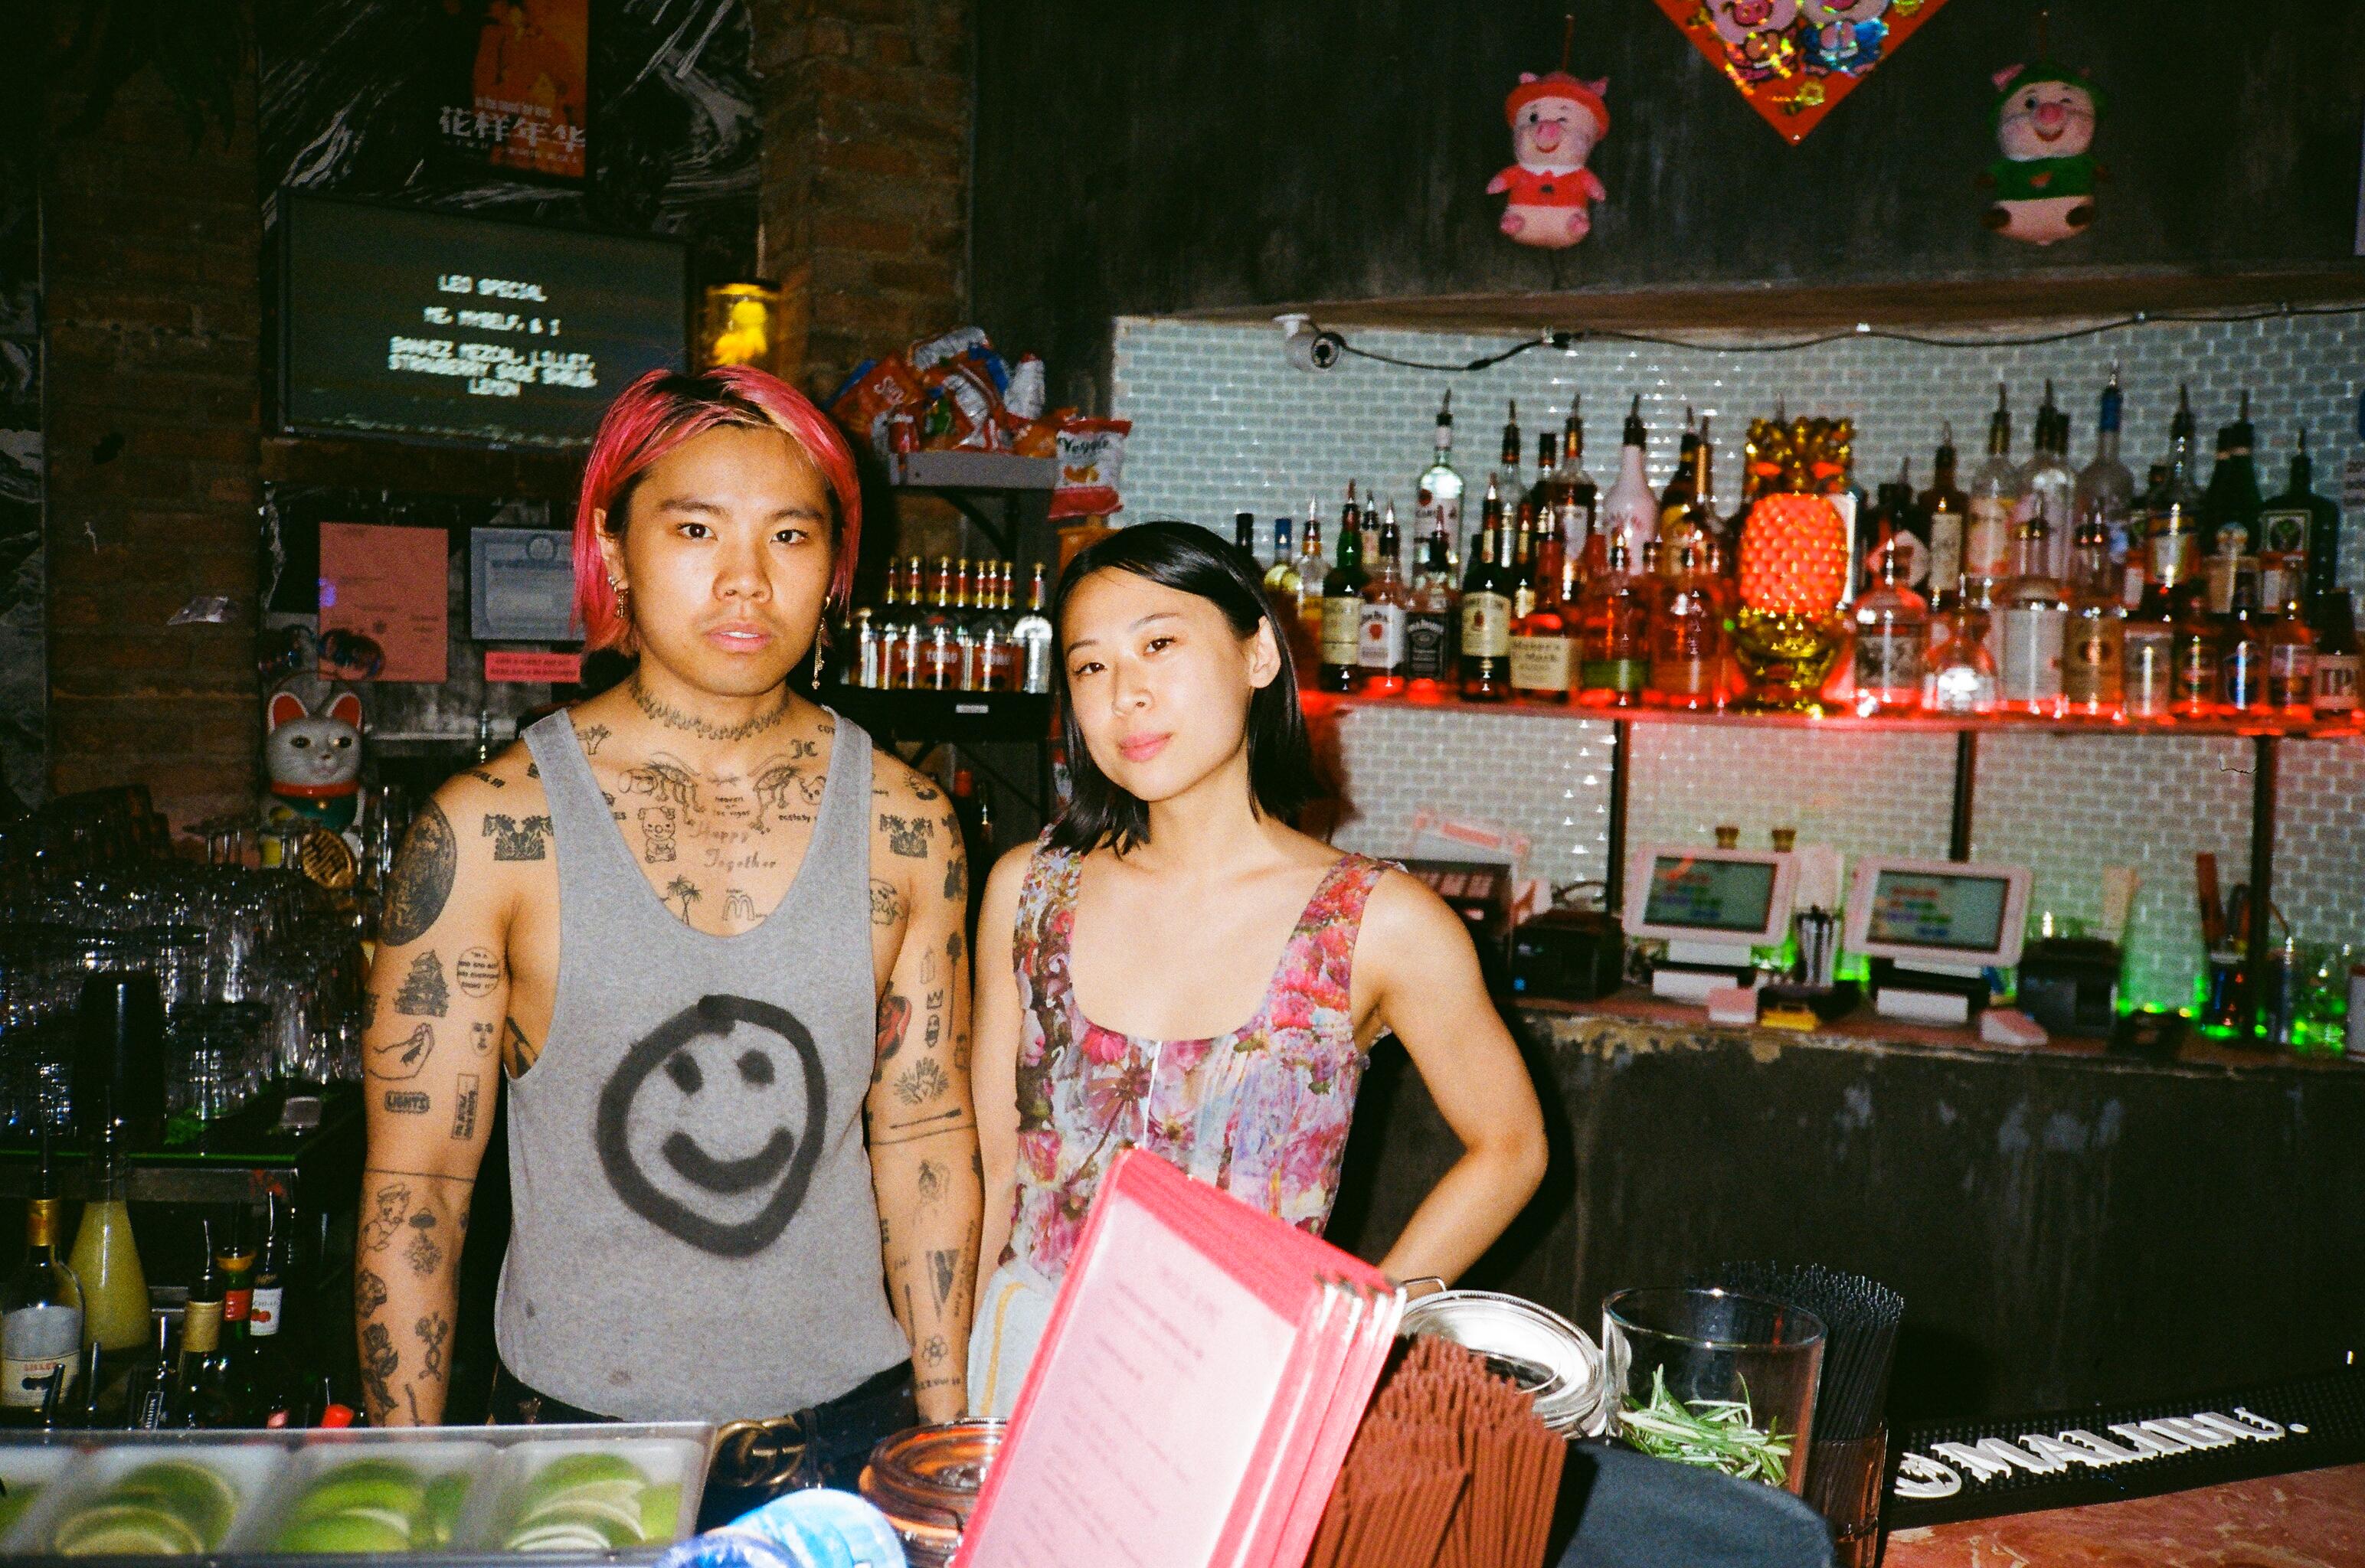 Brooklyn hook up bars